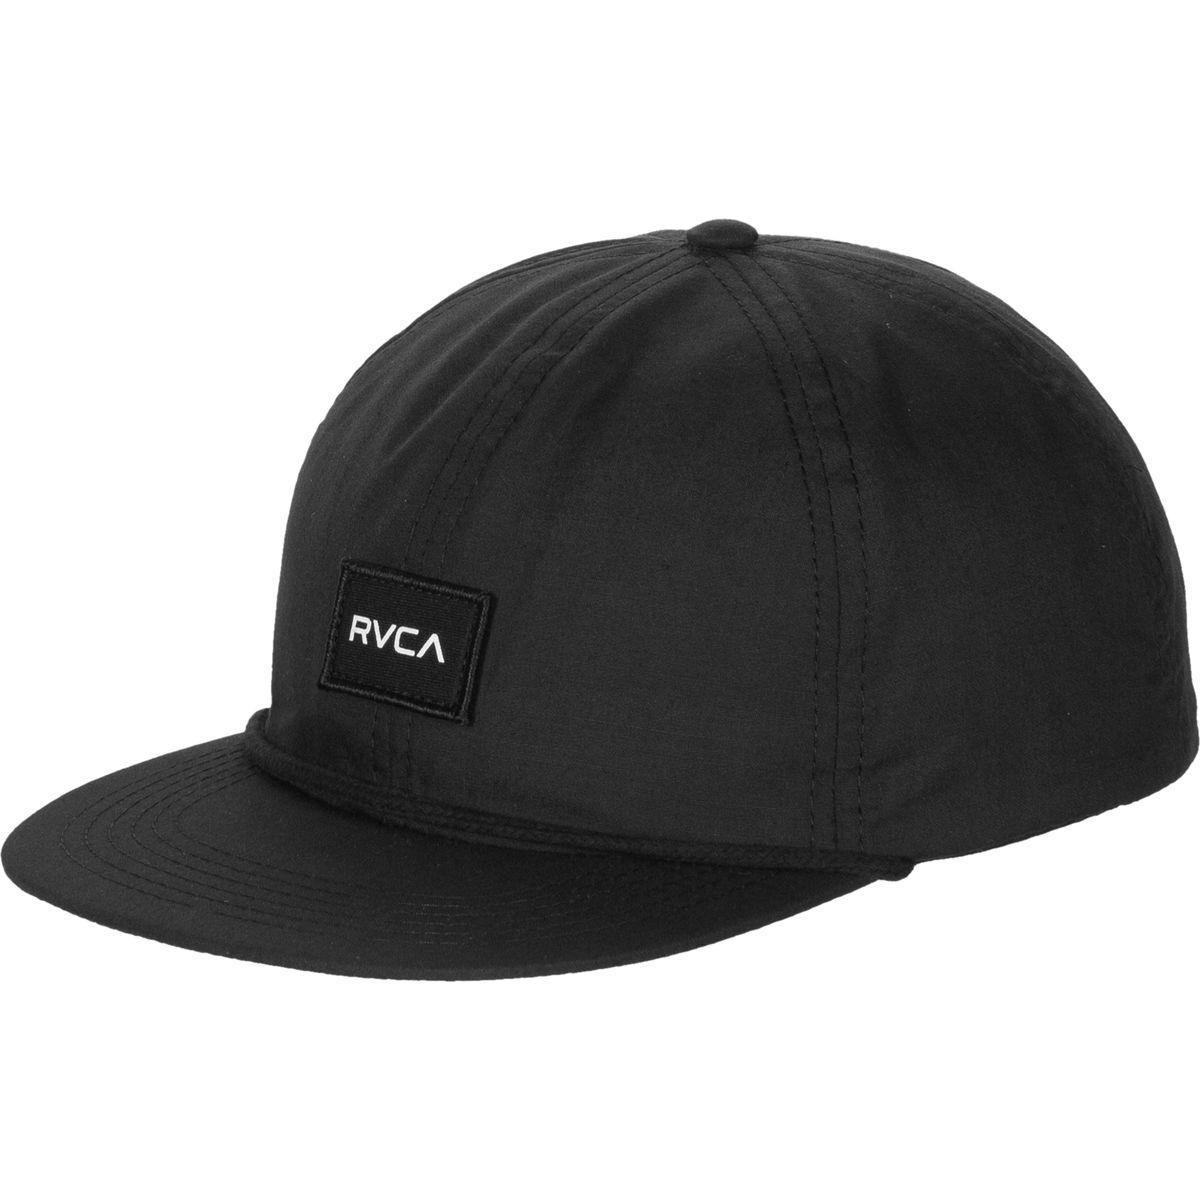 Lyst - RVCA Curren Caples Cap in Black for Men 3da2cbfdadba